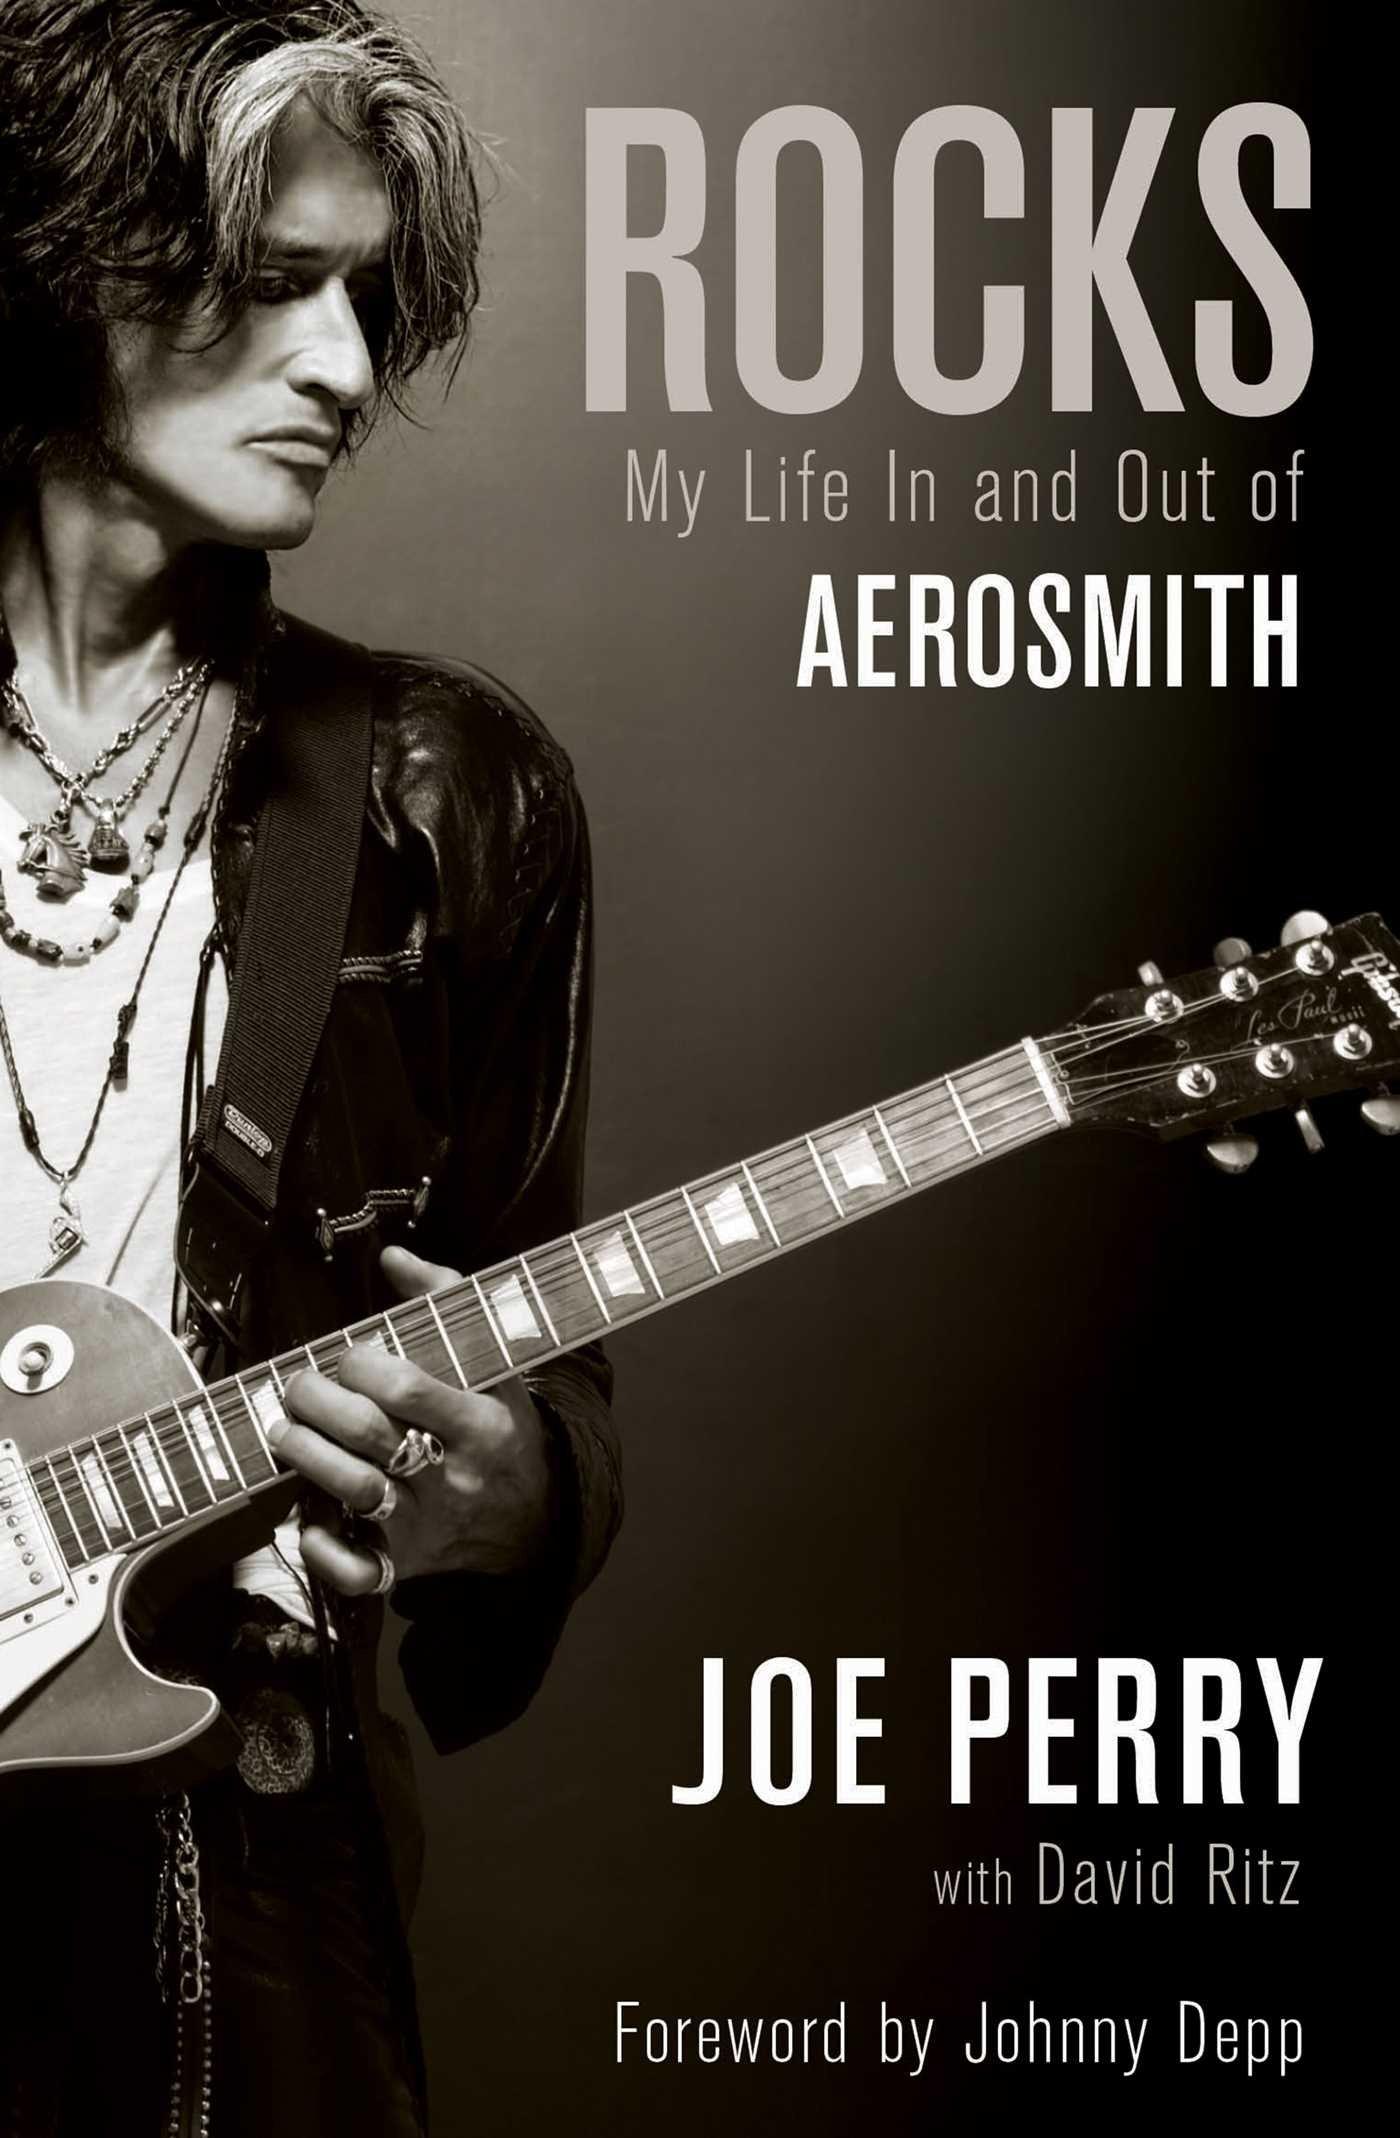 Rocks: My Life in and out of Aerosmith: Amazon.co.uk: Joe Perry, David  Ritz: 9781471138621: Books